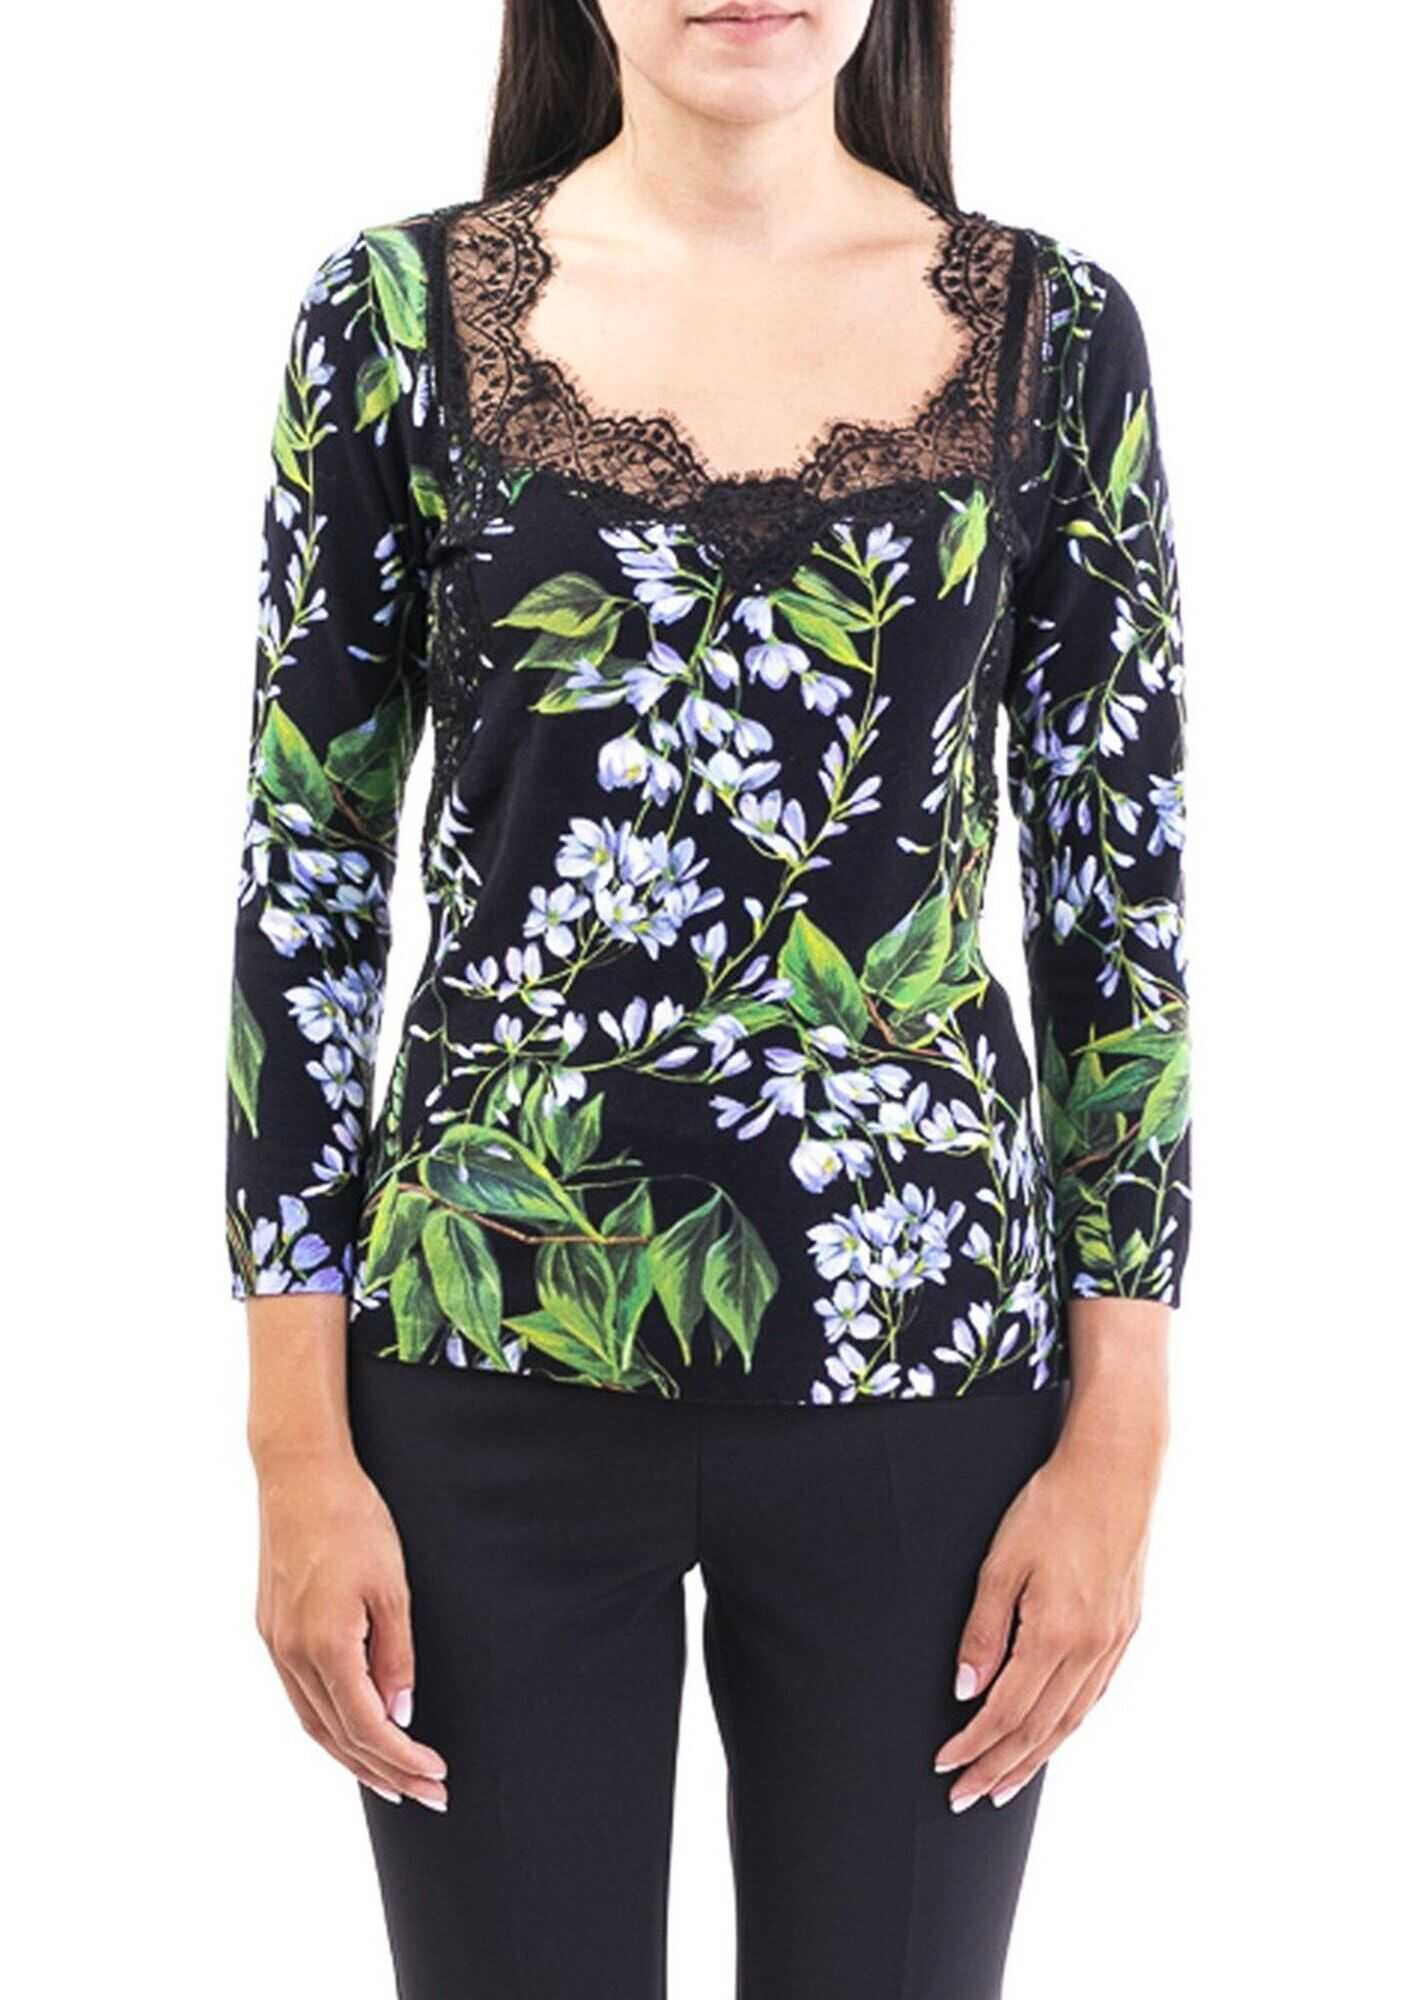 Blumarine Floral Print Viscose Top Black